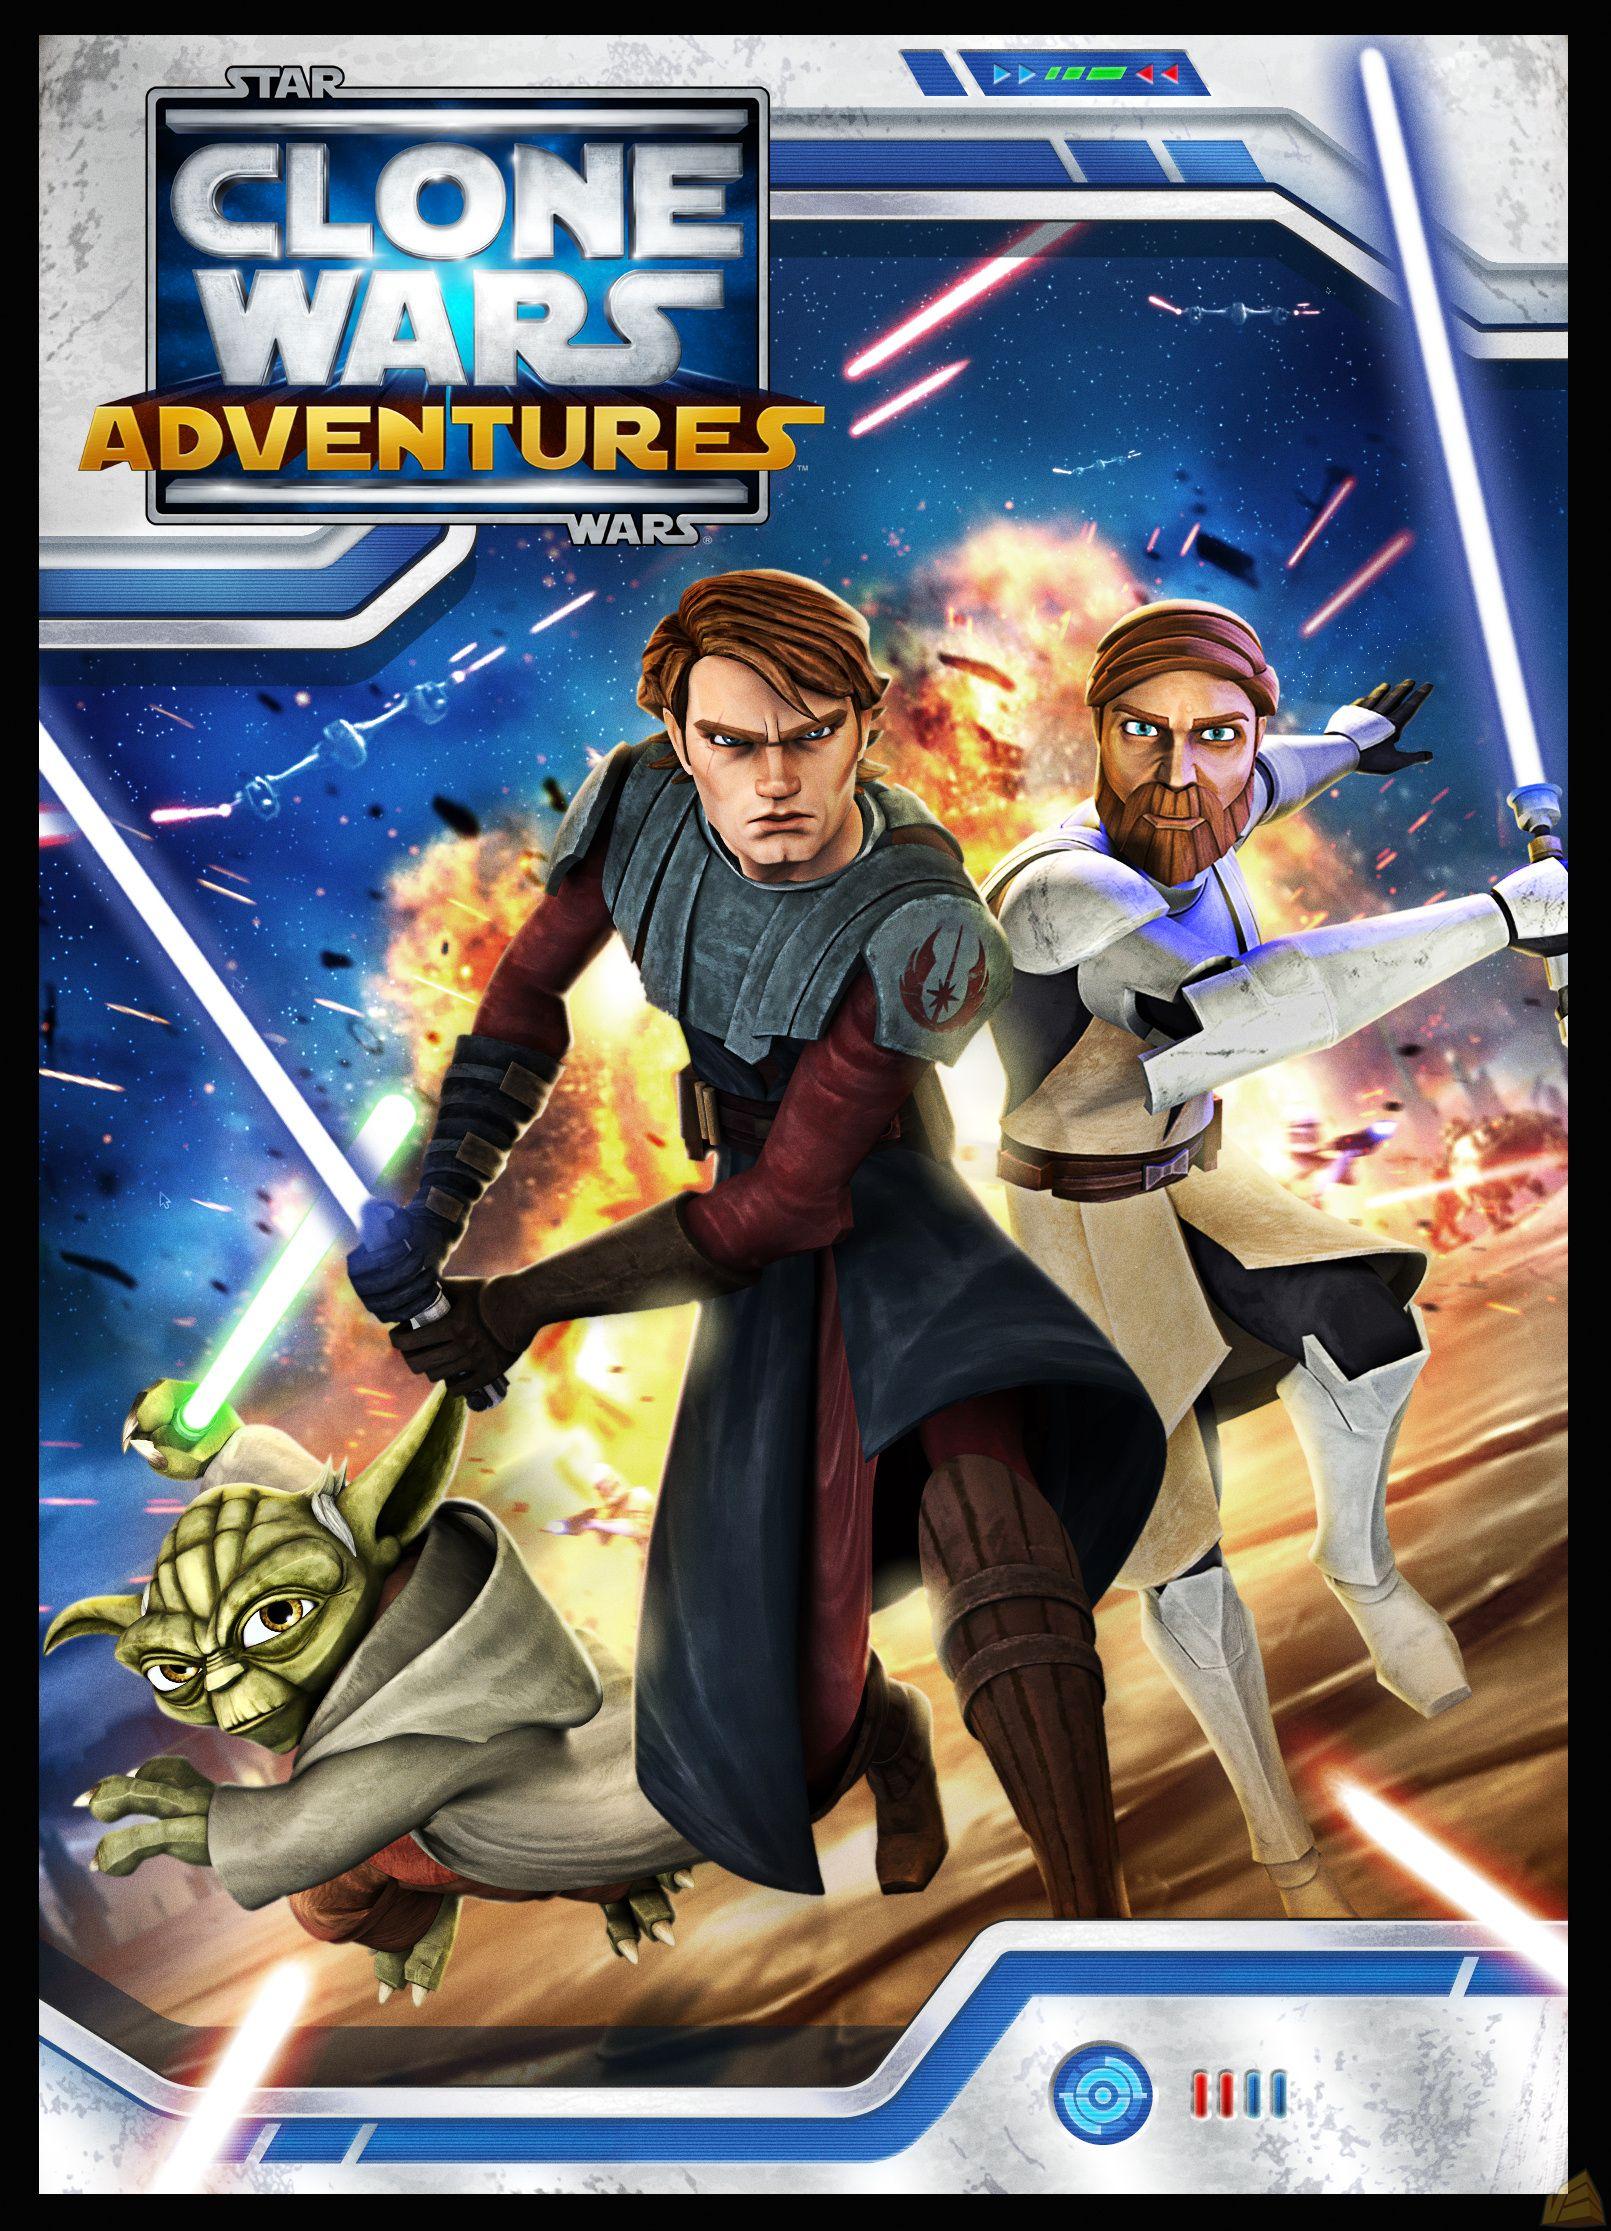 LEGO Star Wars: The Video Game | Wookieepedia | Fandom